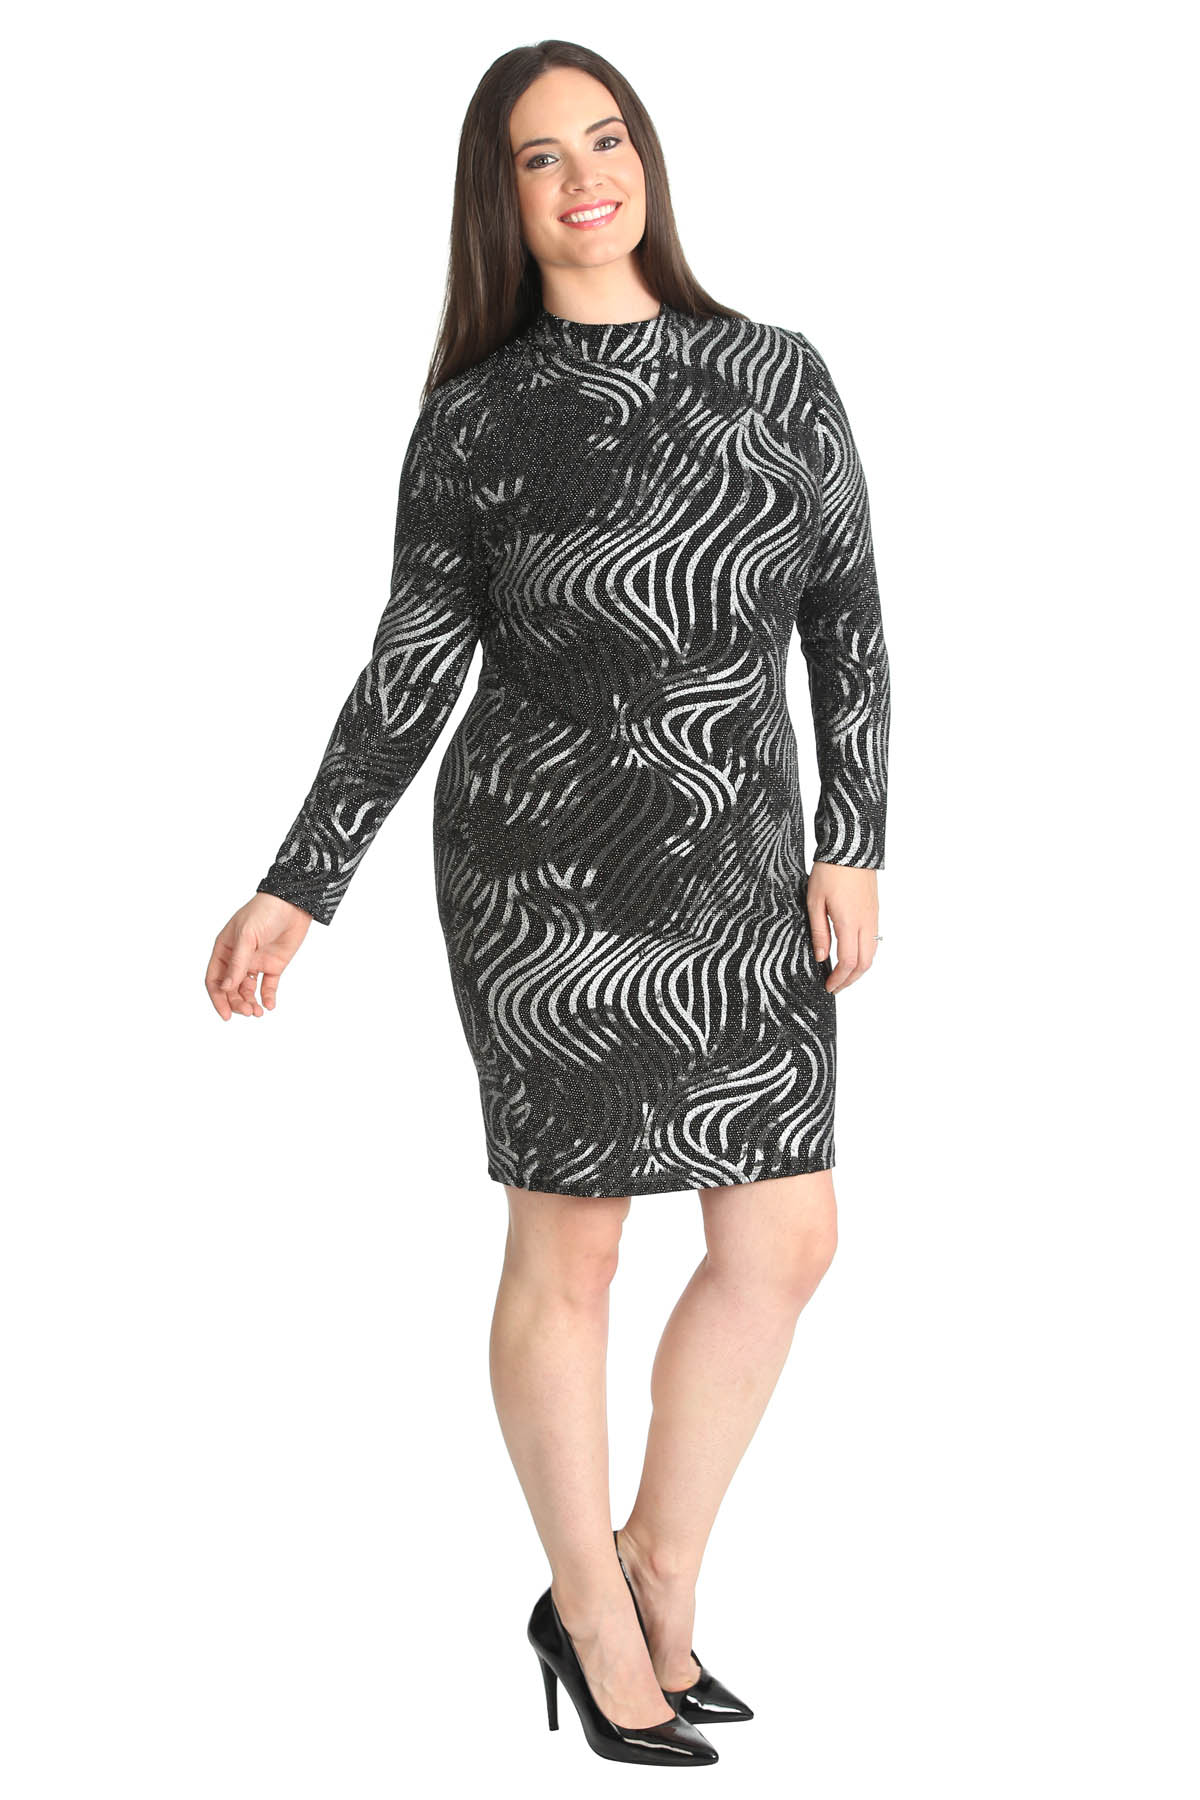 Details about New Ladies Midi Dress Plus Size Lurex Bodycon Polo Neck  Glitter Womens Nouvelle